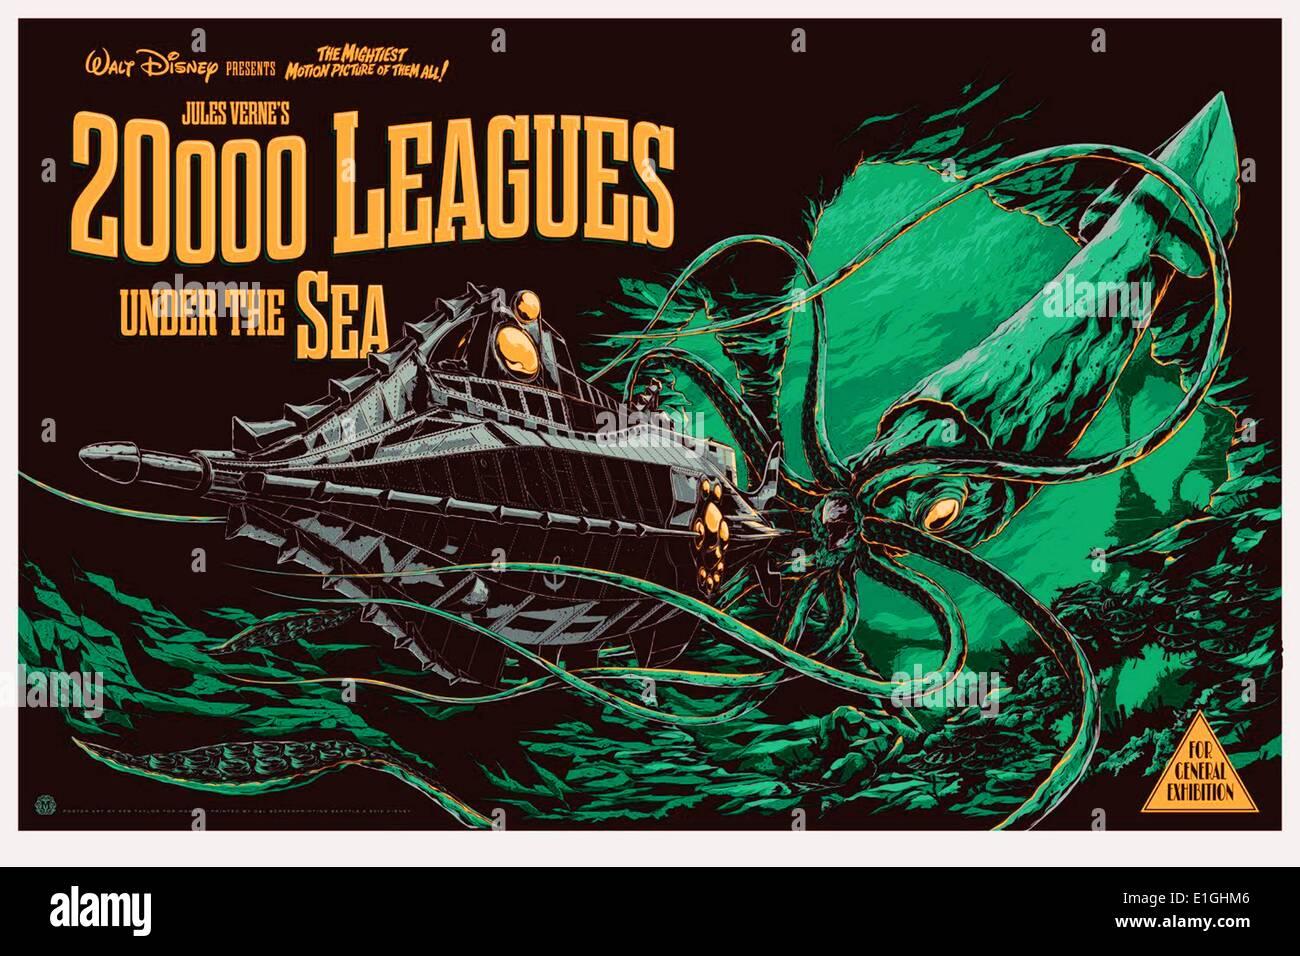 '20,000 Leagues Under The Sea' a 1954 American adventure film starring Kirk Douglas. - Stock Image